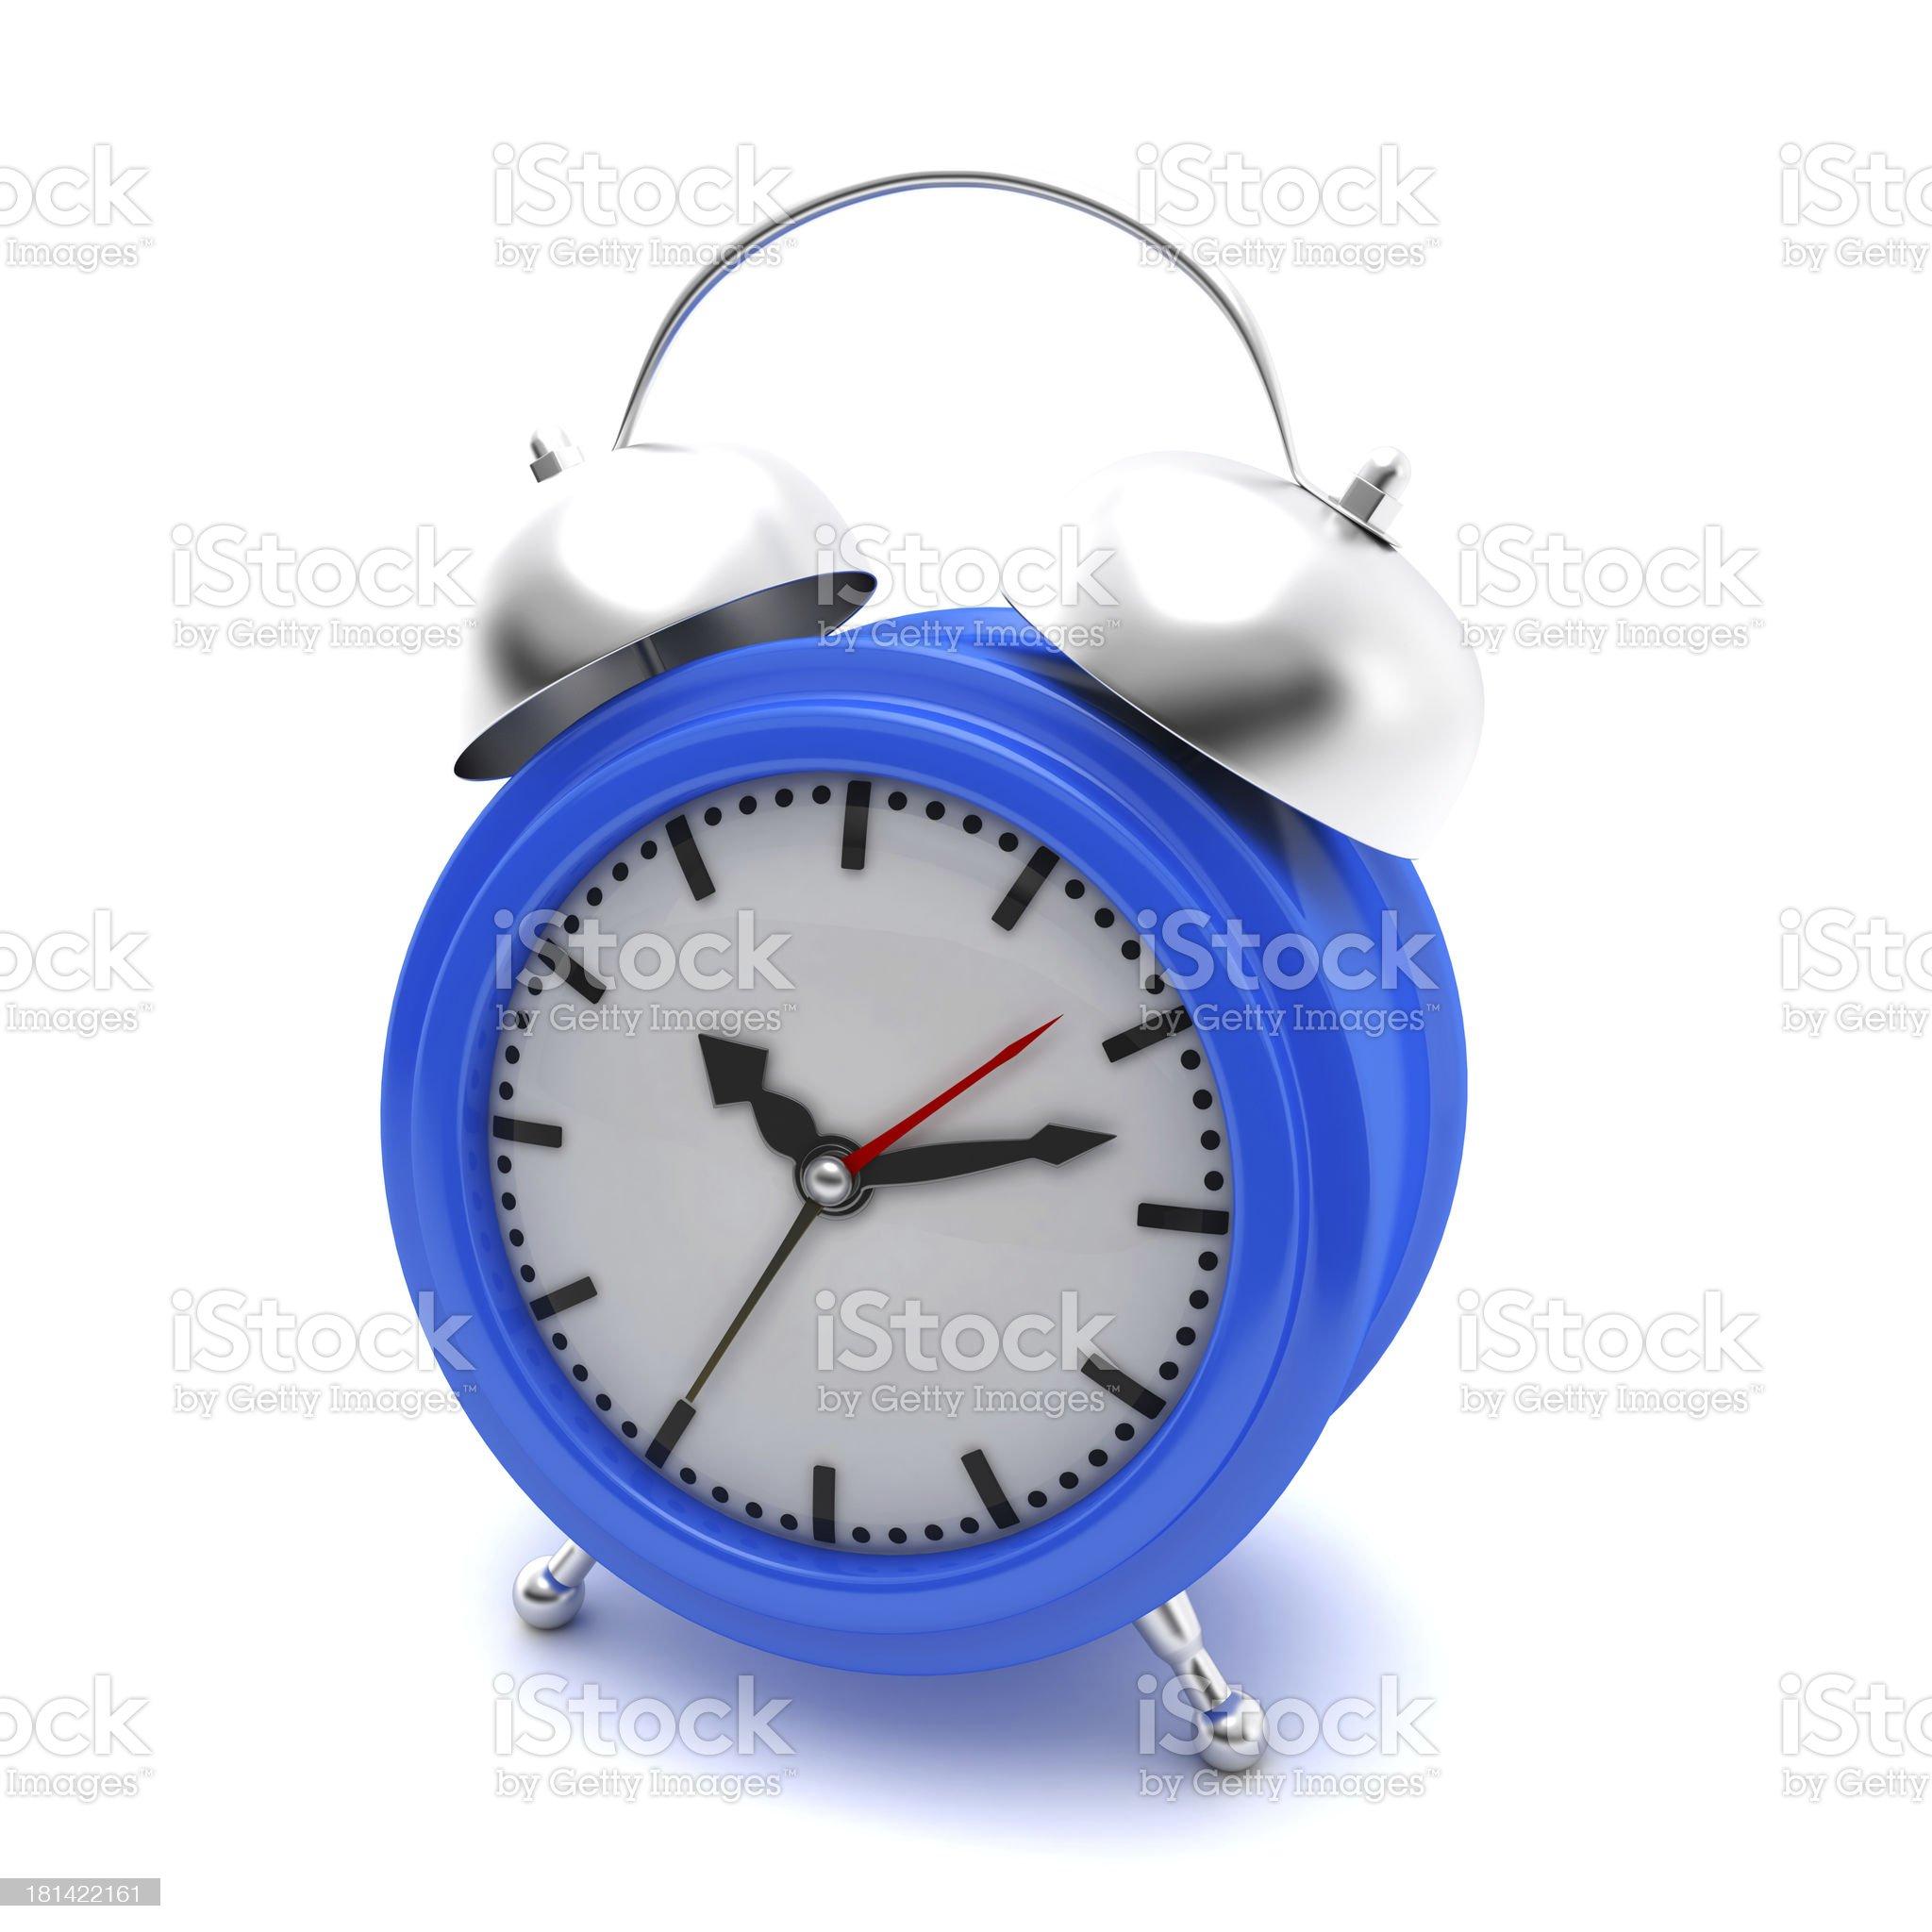 Blue Alarm Clock royalty-free stock photo